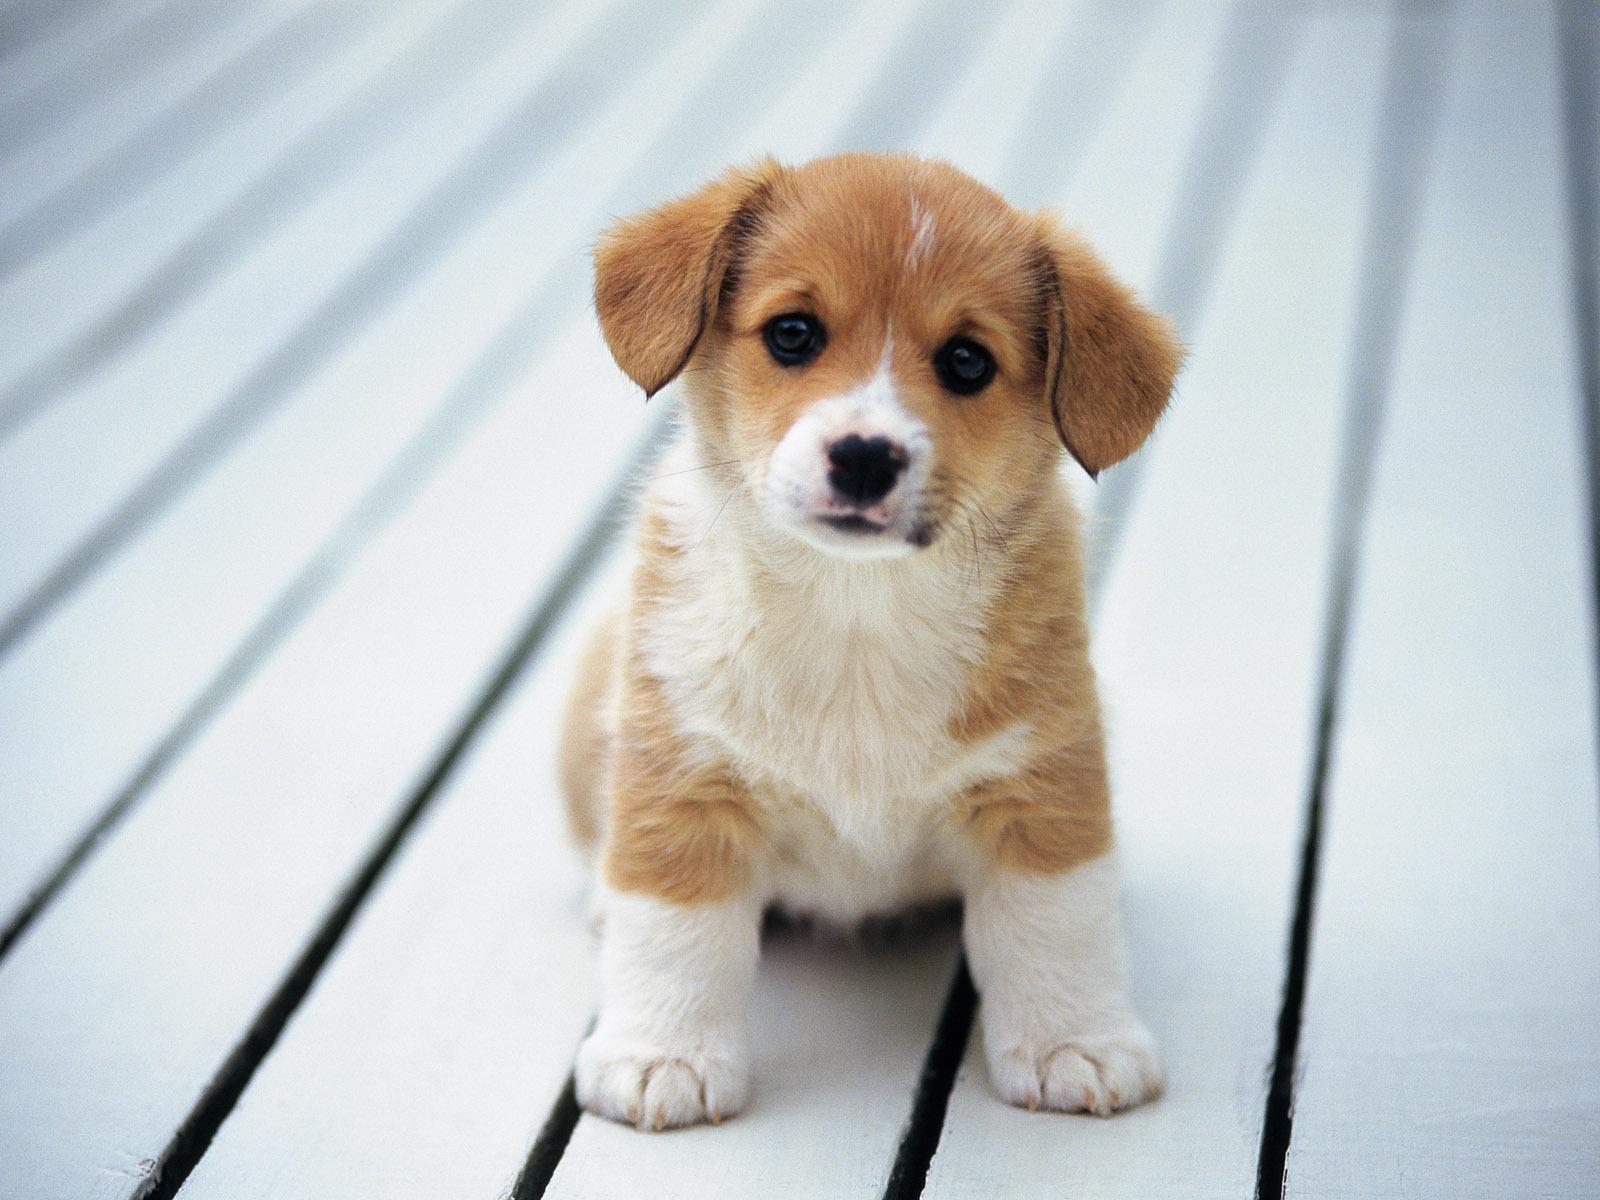 30 Gambar Anak Anjing Yang Lucu Lucu Dangstars